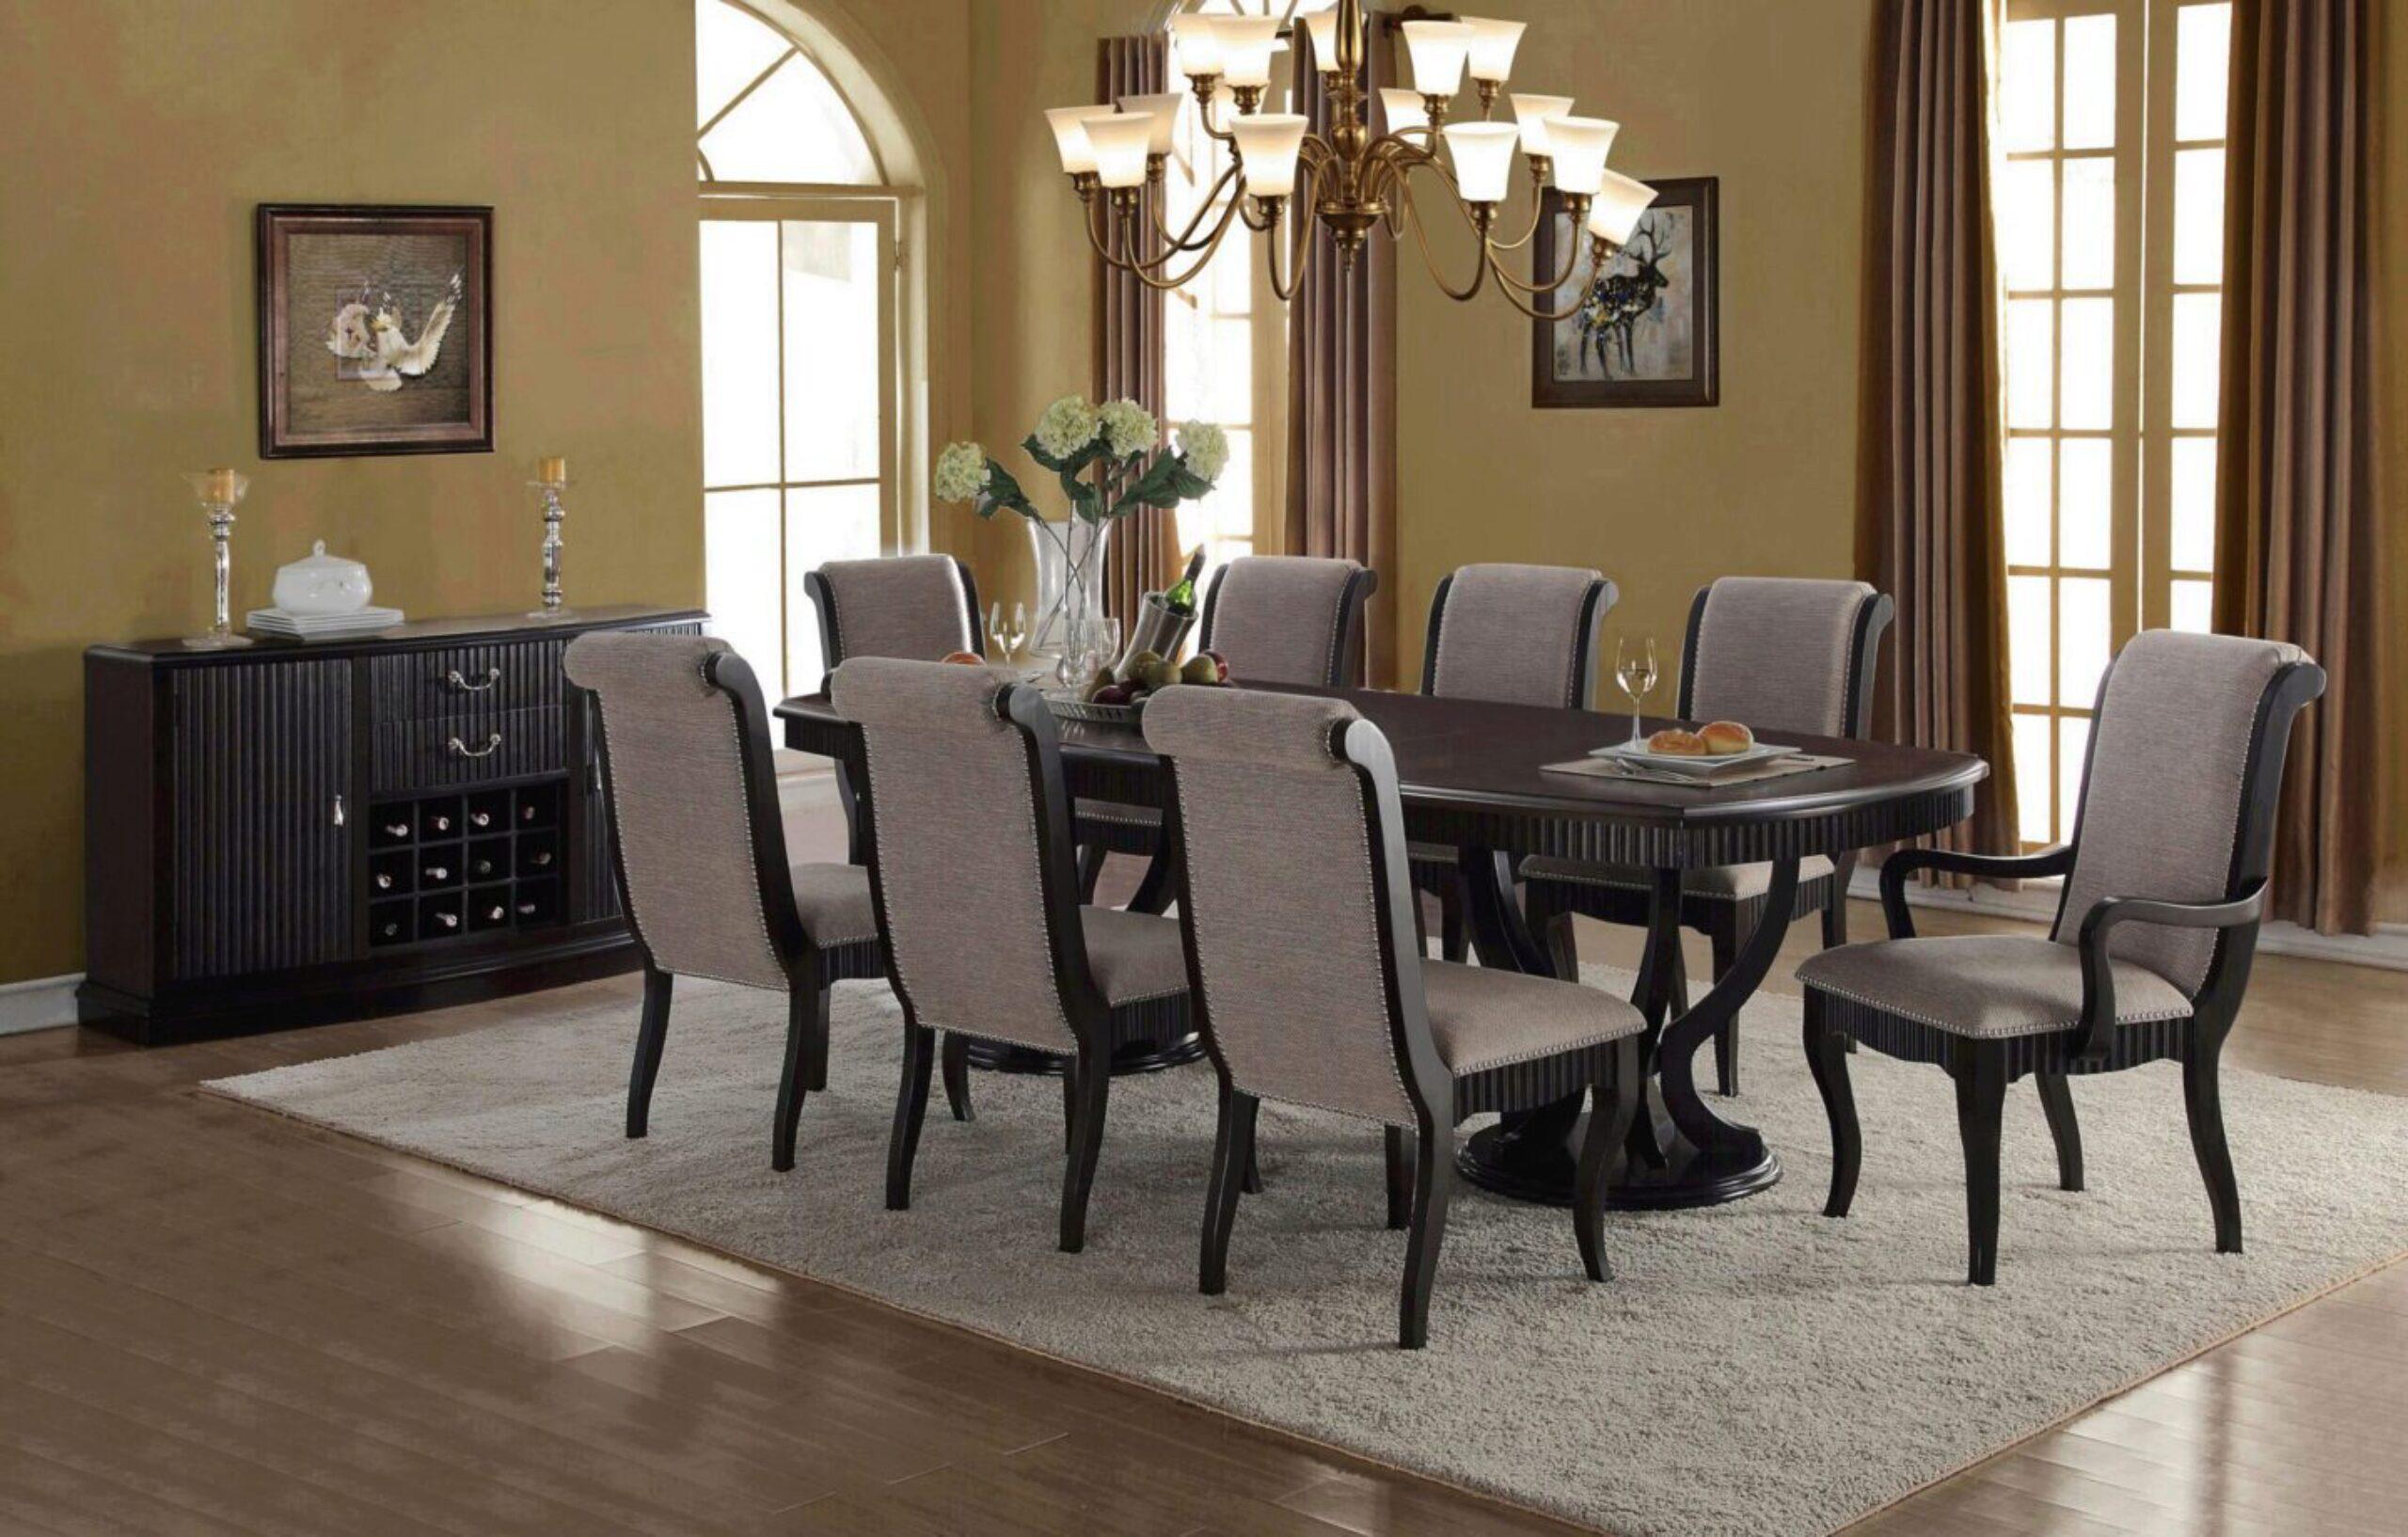 Formal Dark Brown Espresso Finish Grey, Formal Dining Room Table Set Up